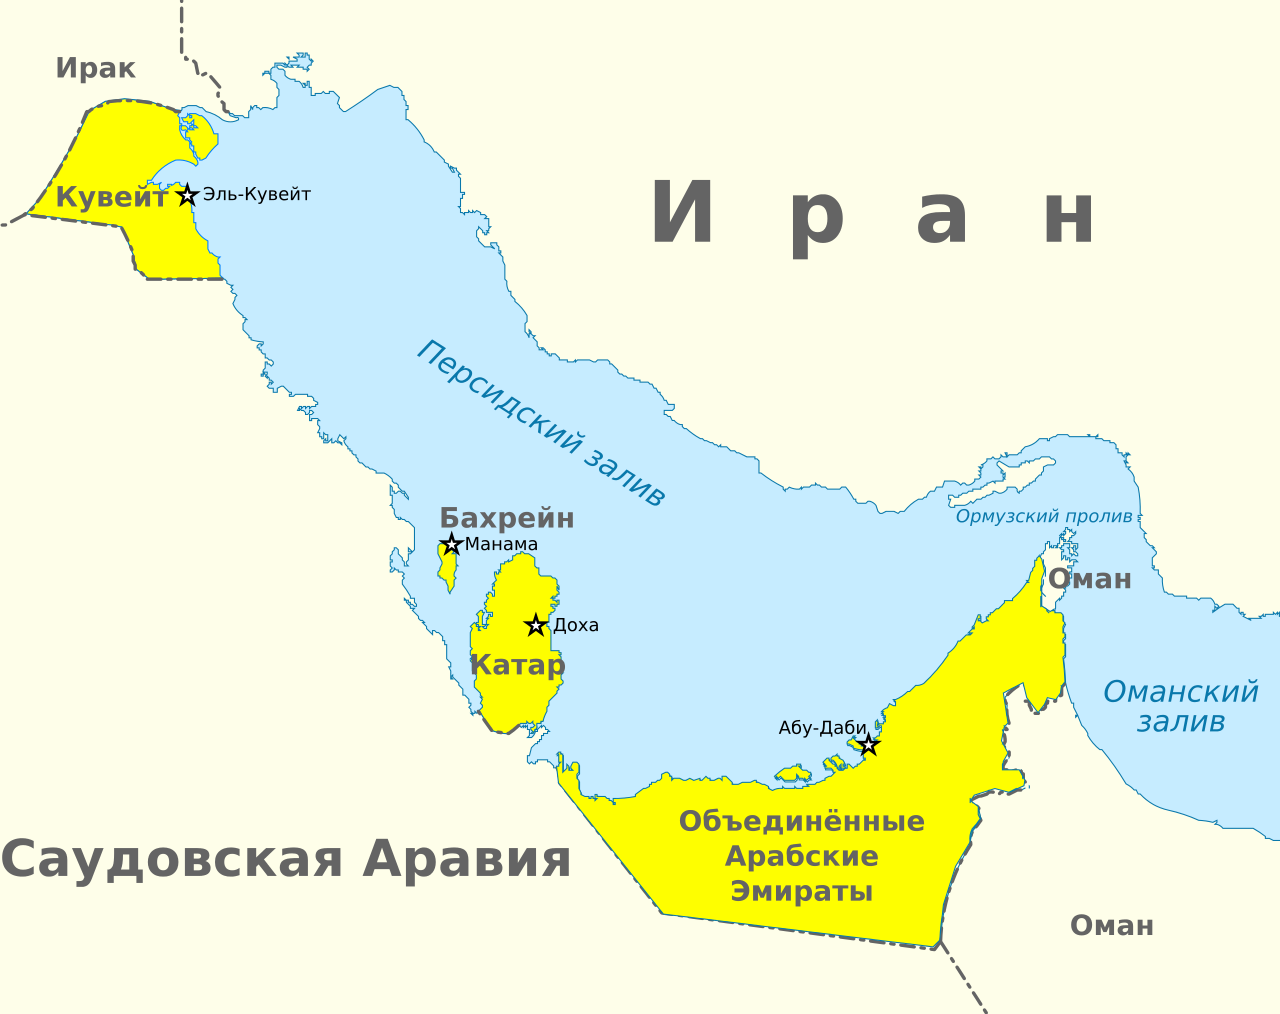 Картинки по запросу ормузский пролив на карте